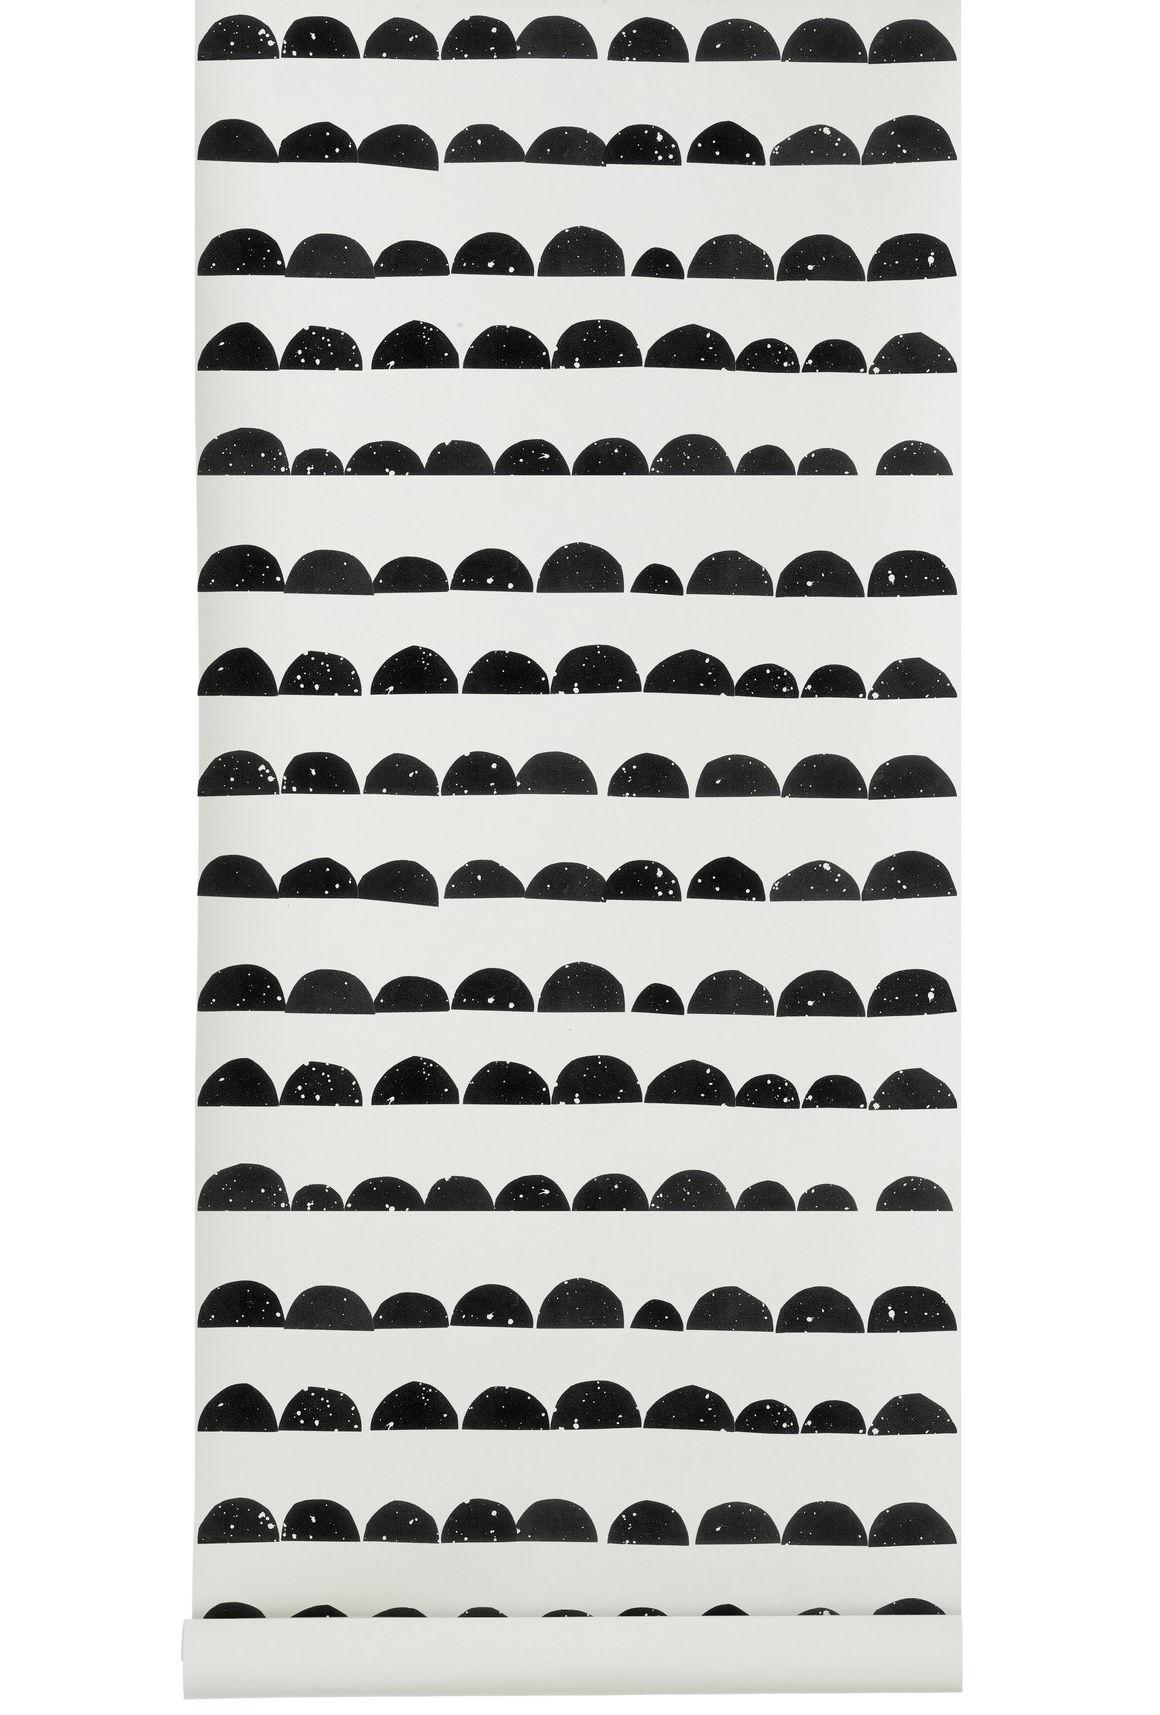 Interni - Sticker - Carta da parati Half Moon - / 1 striscia - Larg 53 cm di Ferm Living - Nero, Bianco - Tela